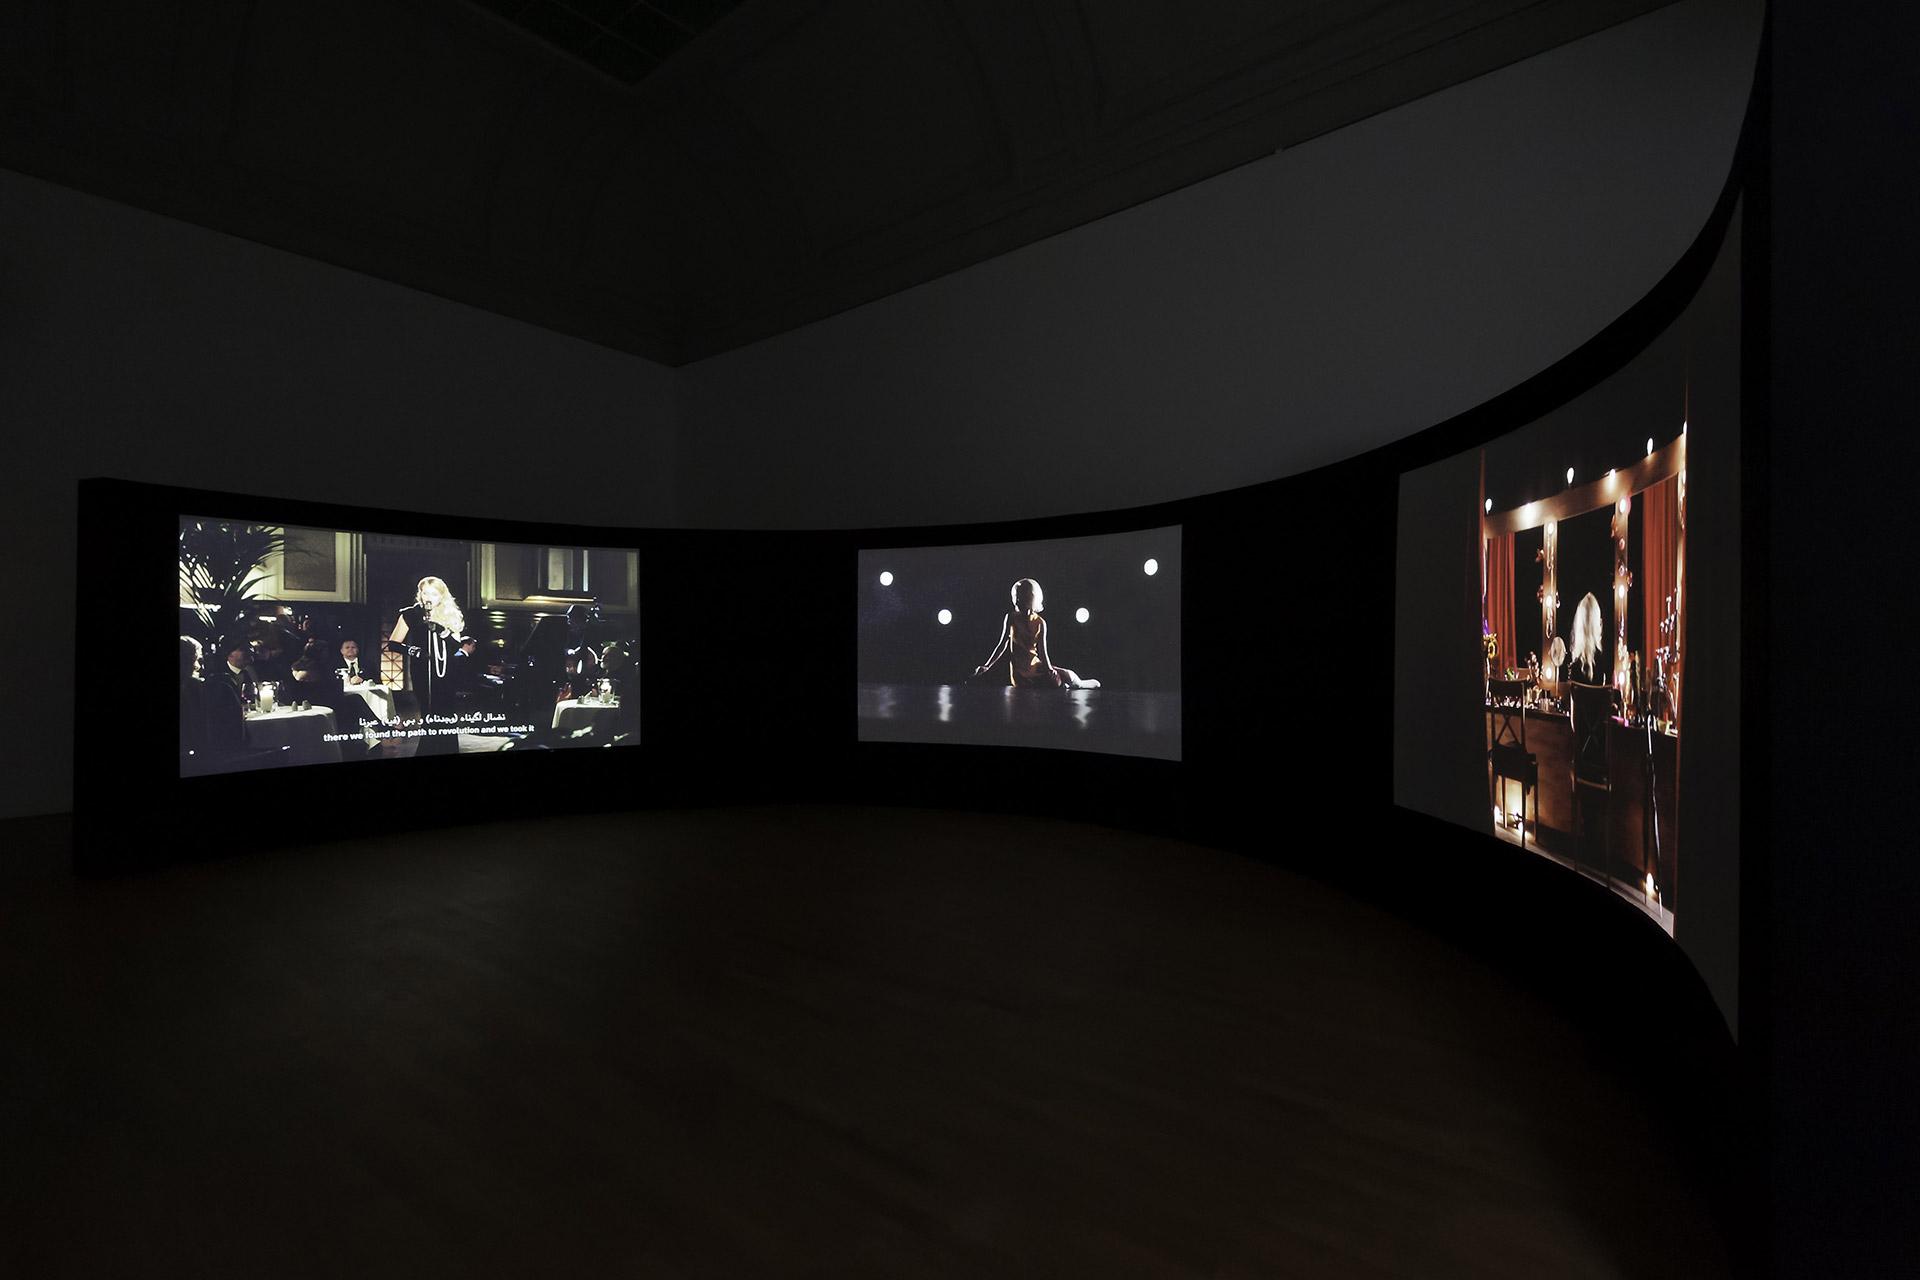 Adel-Abidin-Kunsthalle-Winterthur-2012-1.jpg